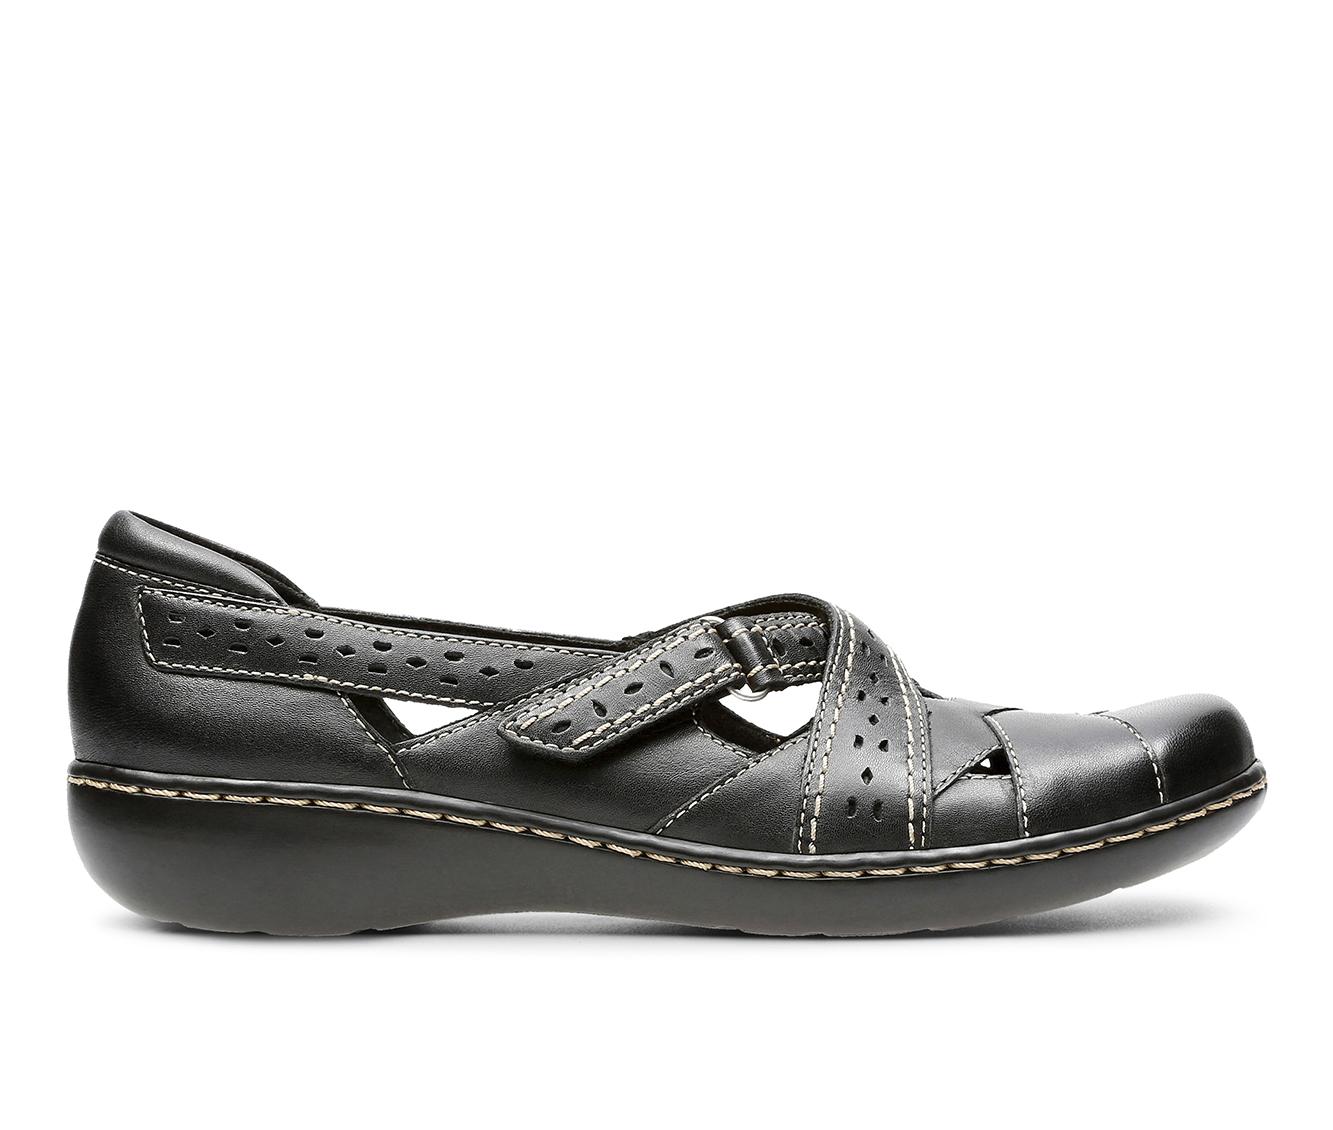 Clarks Ashland Spin Q Women's Shoe (Black Leather)